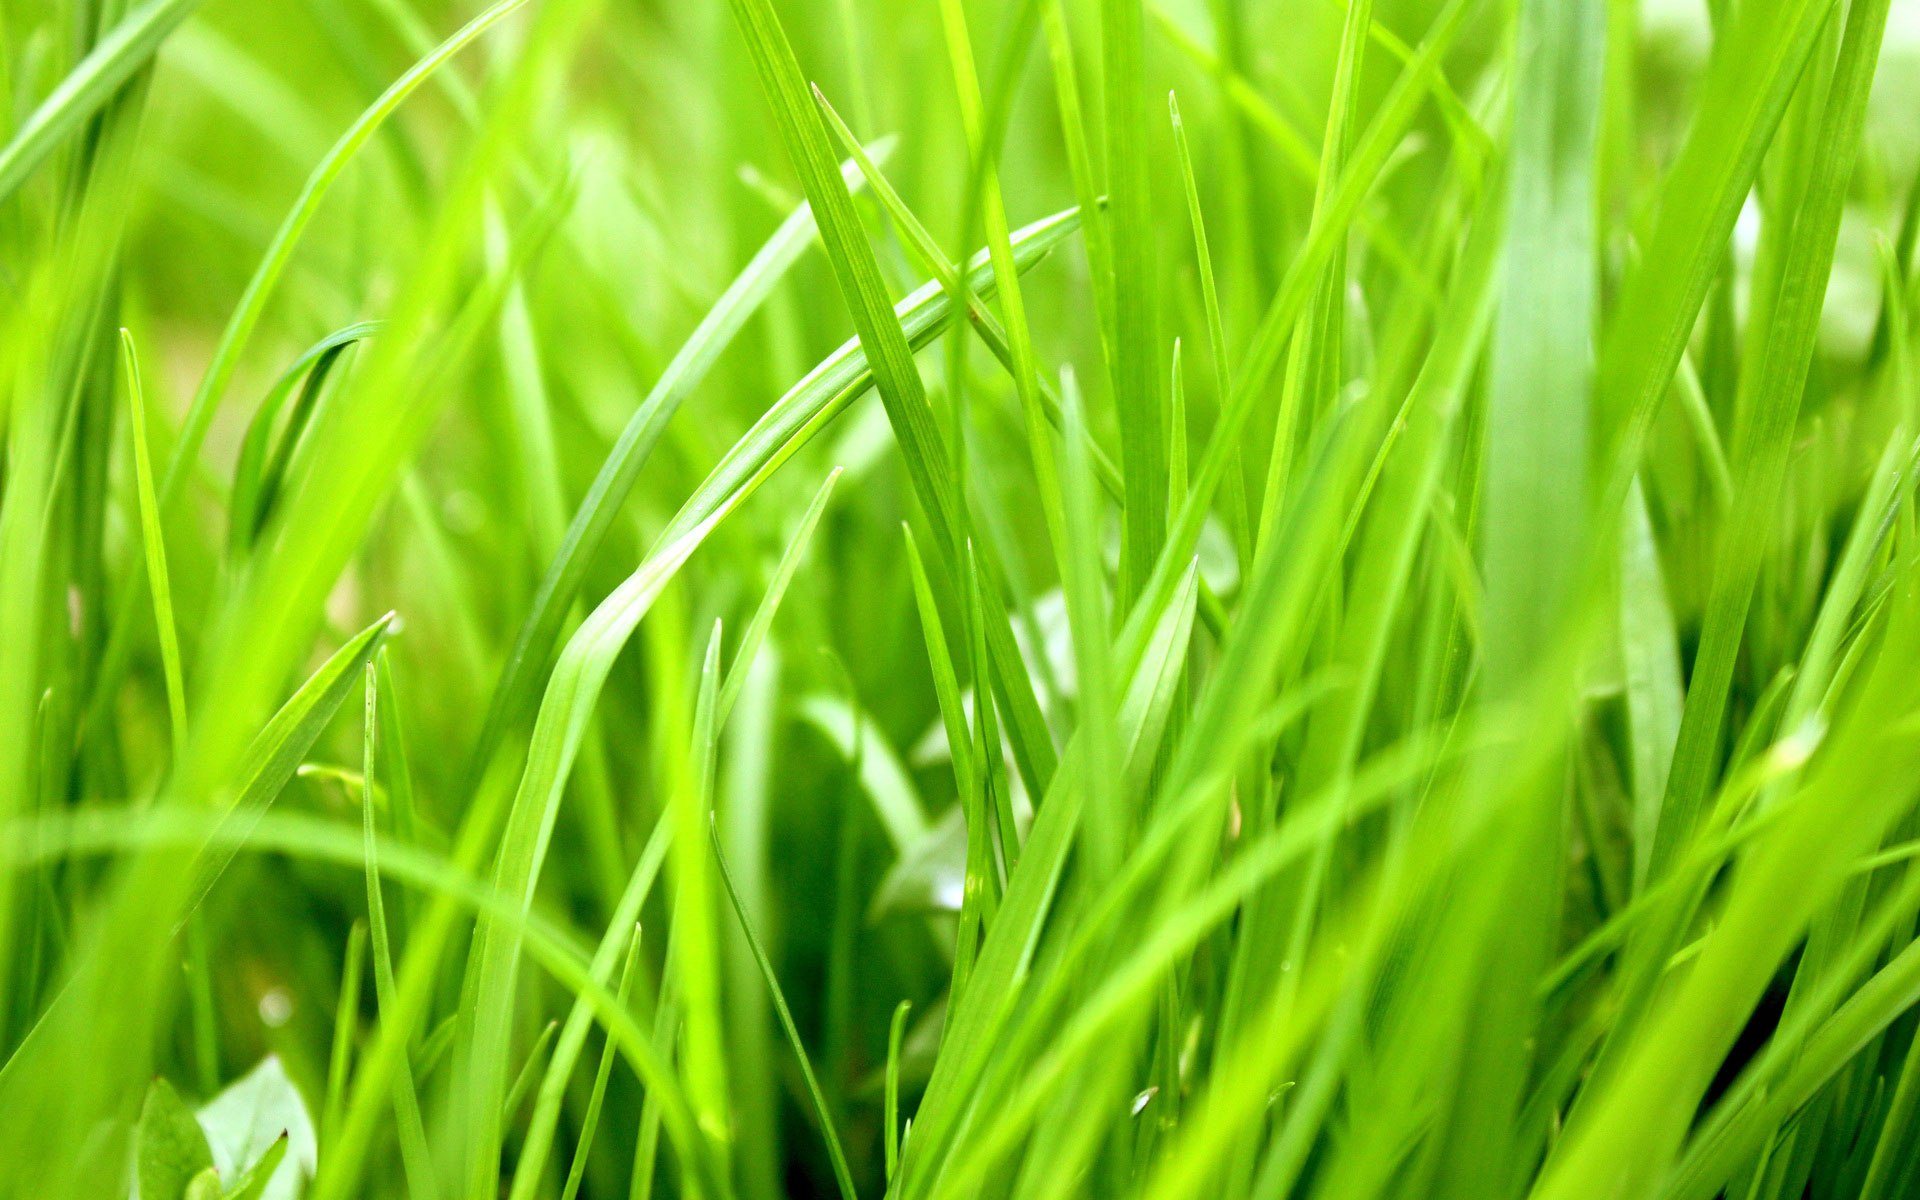 Pin Bright Green Grass Hd Wallpaper Placecom 1920x1200